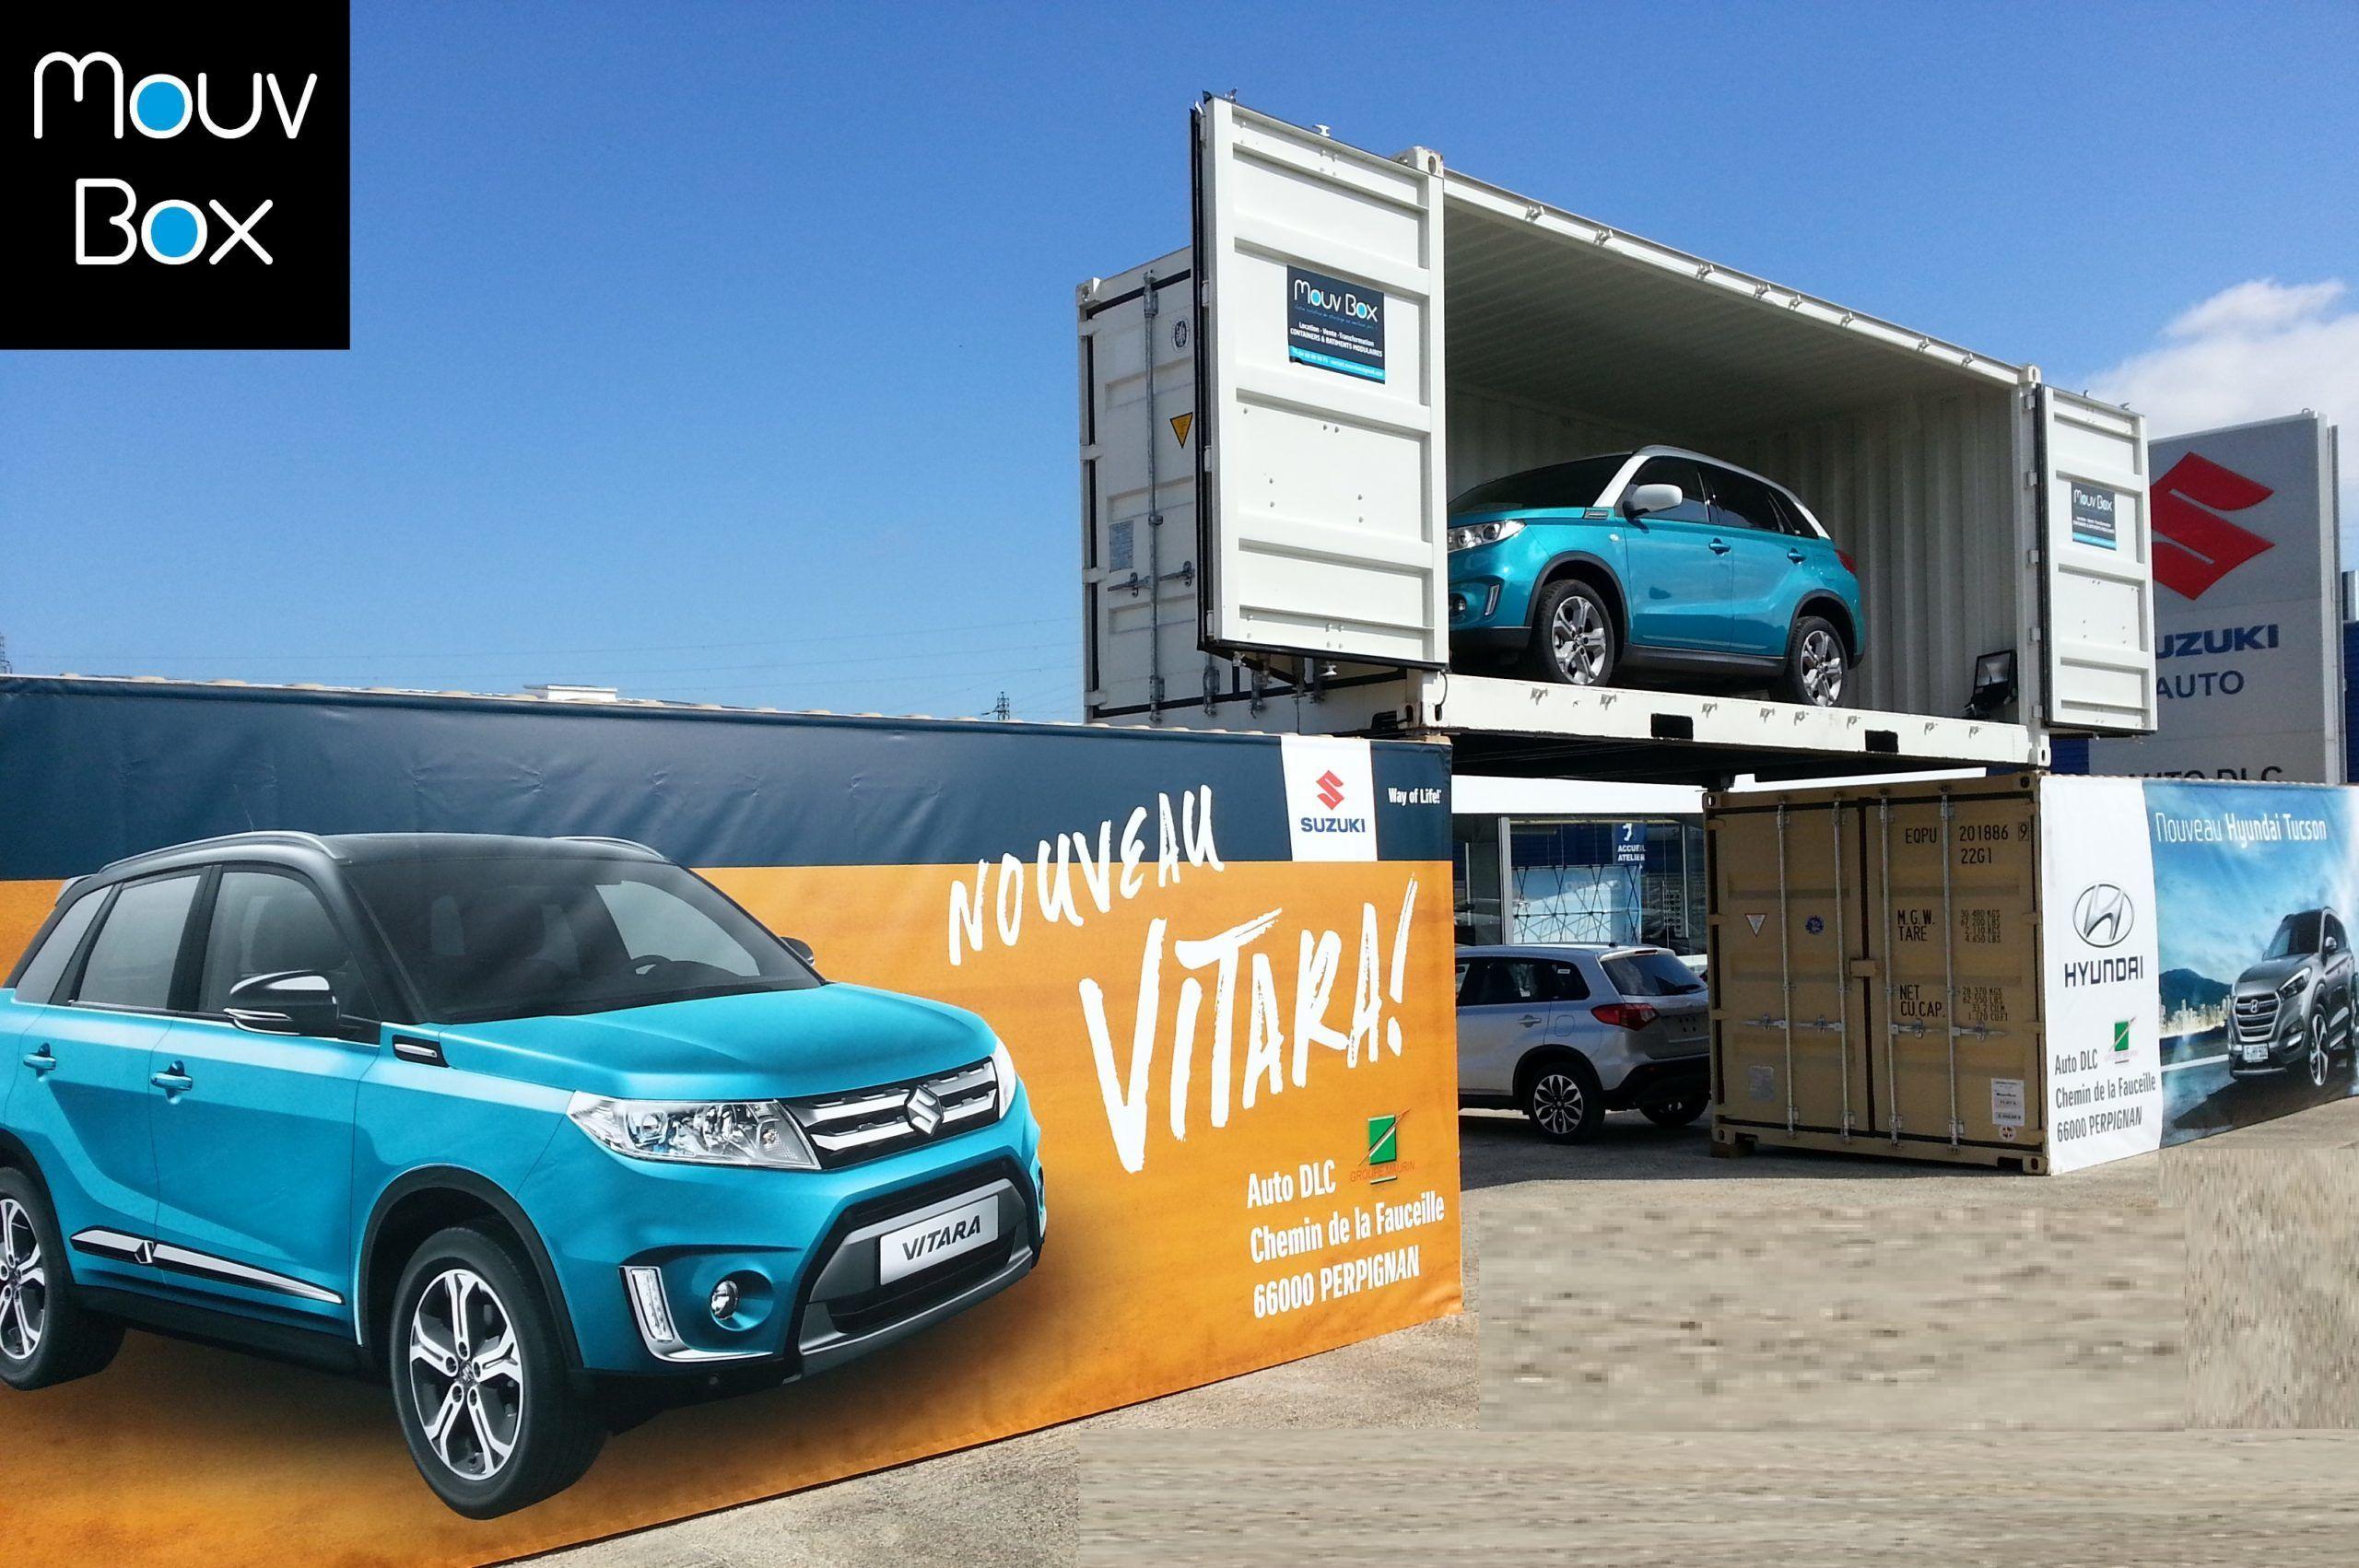 expo-container-auto-dlc-perpignan-www.mouvbox-france.com